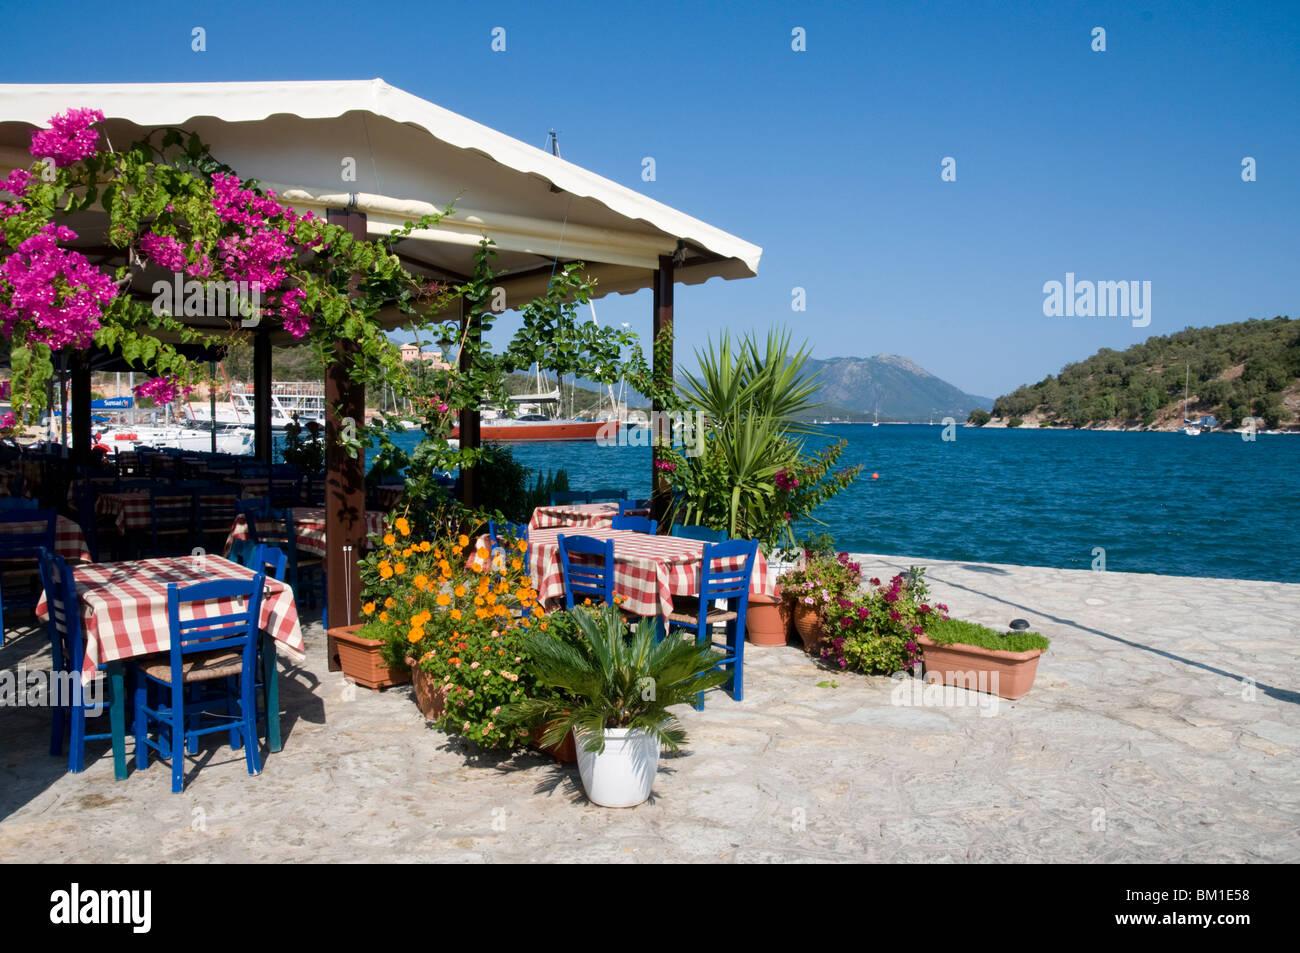 Taverna, Vathi, Meganisi, Ionian Islands, Greek Islands, Greece, Europe - Stock Image